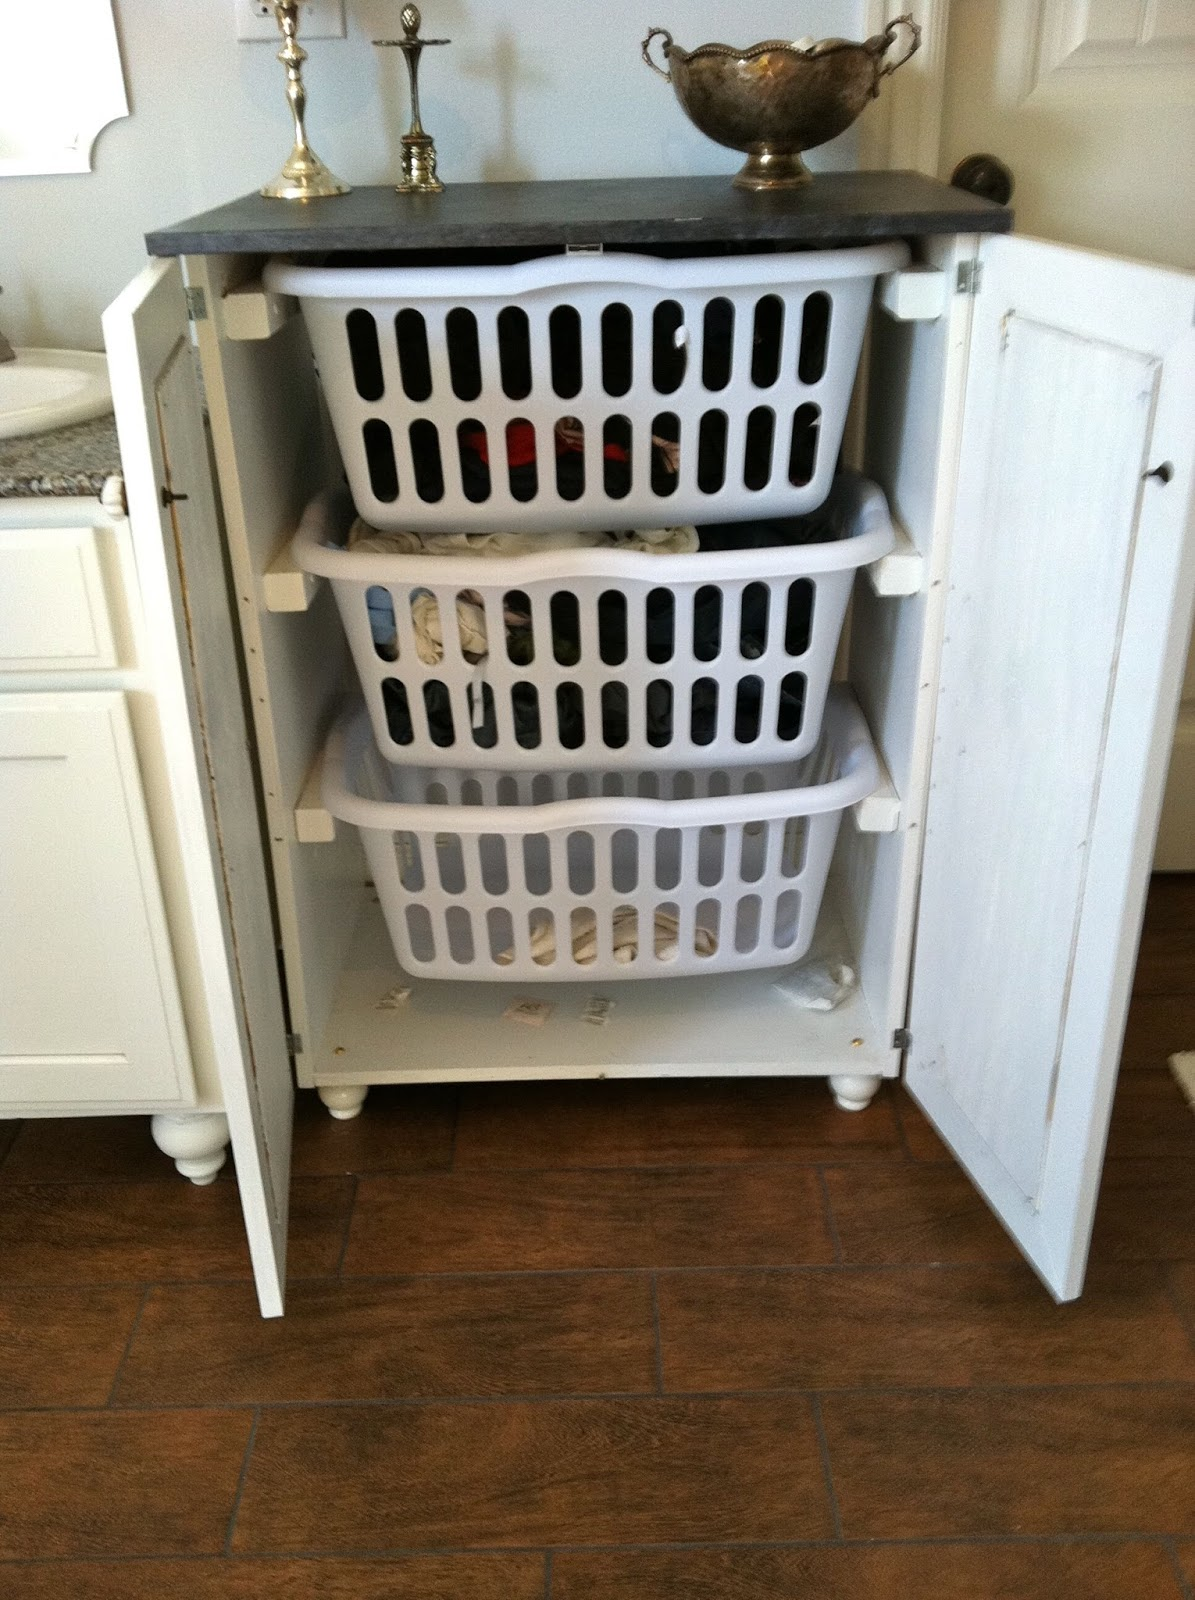 7 diy projects for renters laundry basket dresser pinterest solutioingenieria Gallery